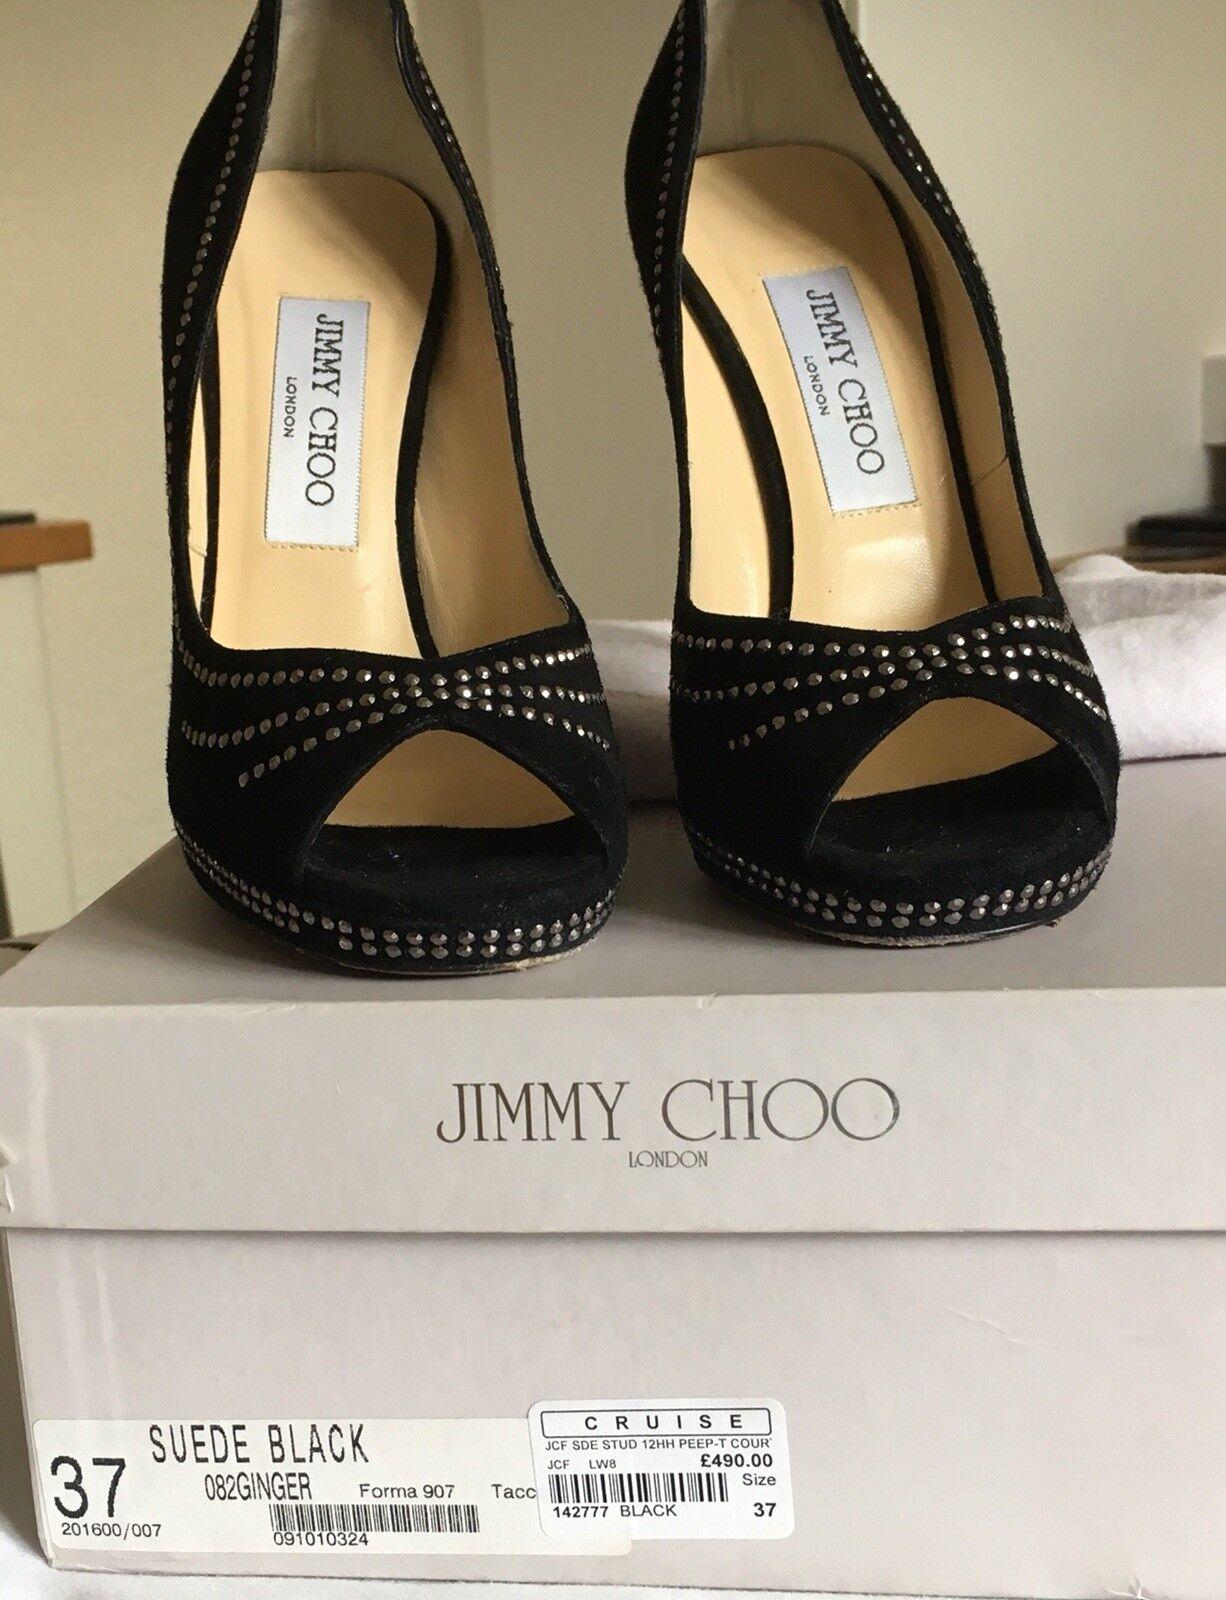 Jimmy Choo Schuhes Größe 37 37 Größe f6ac33